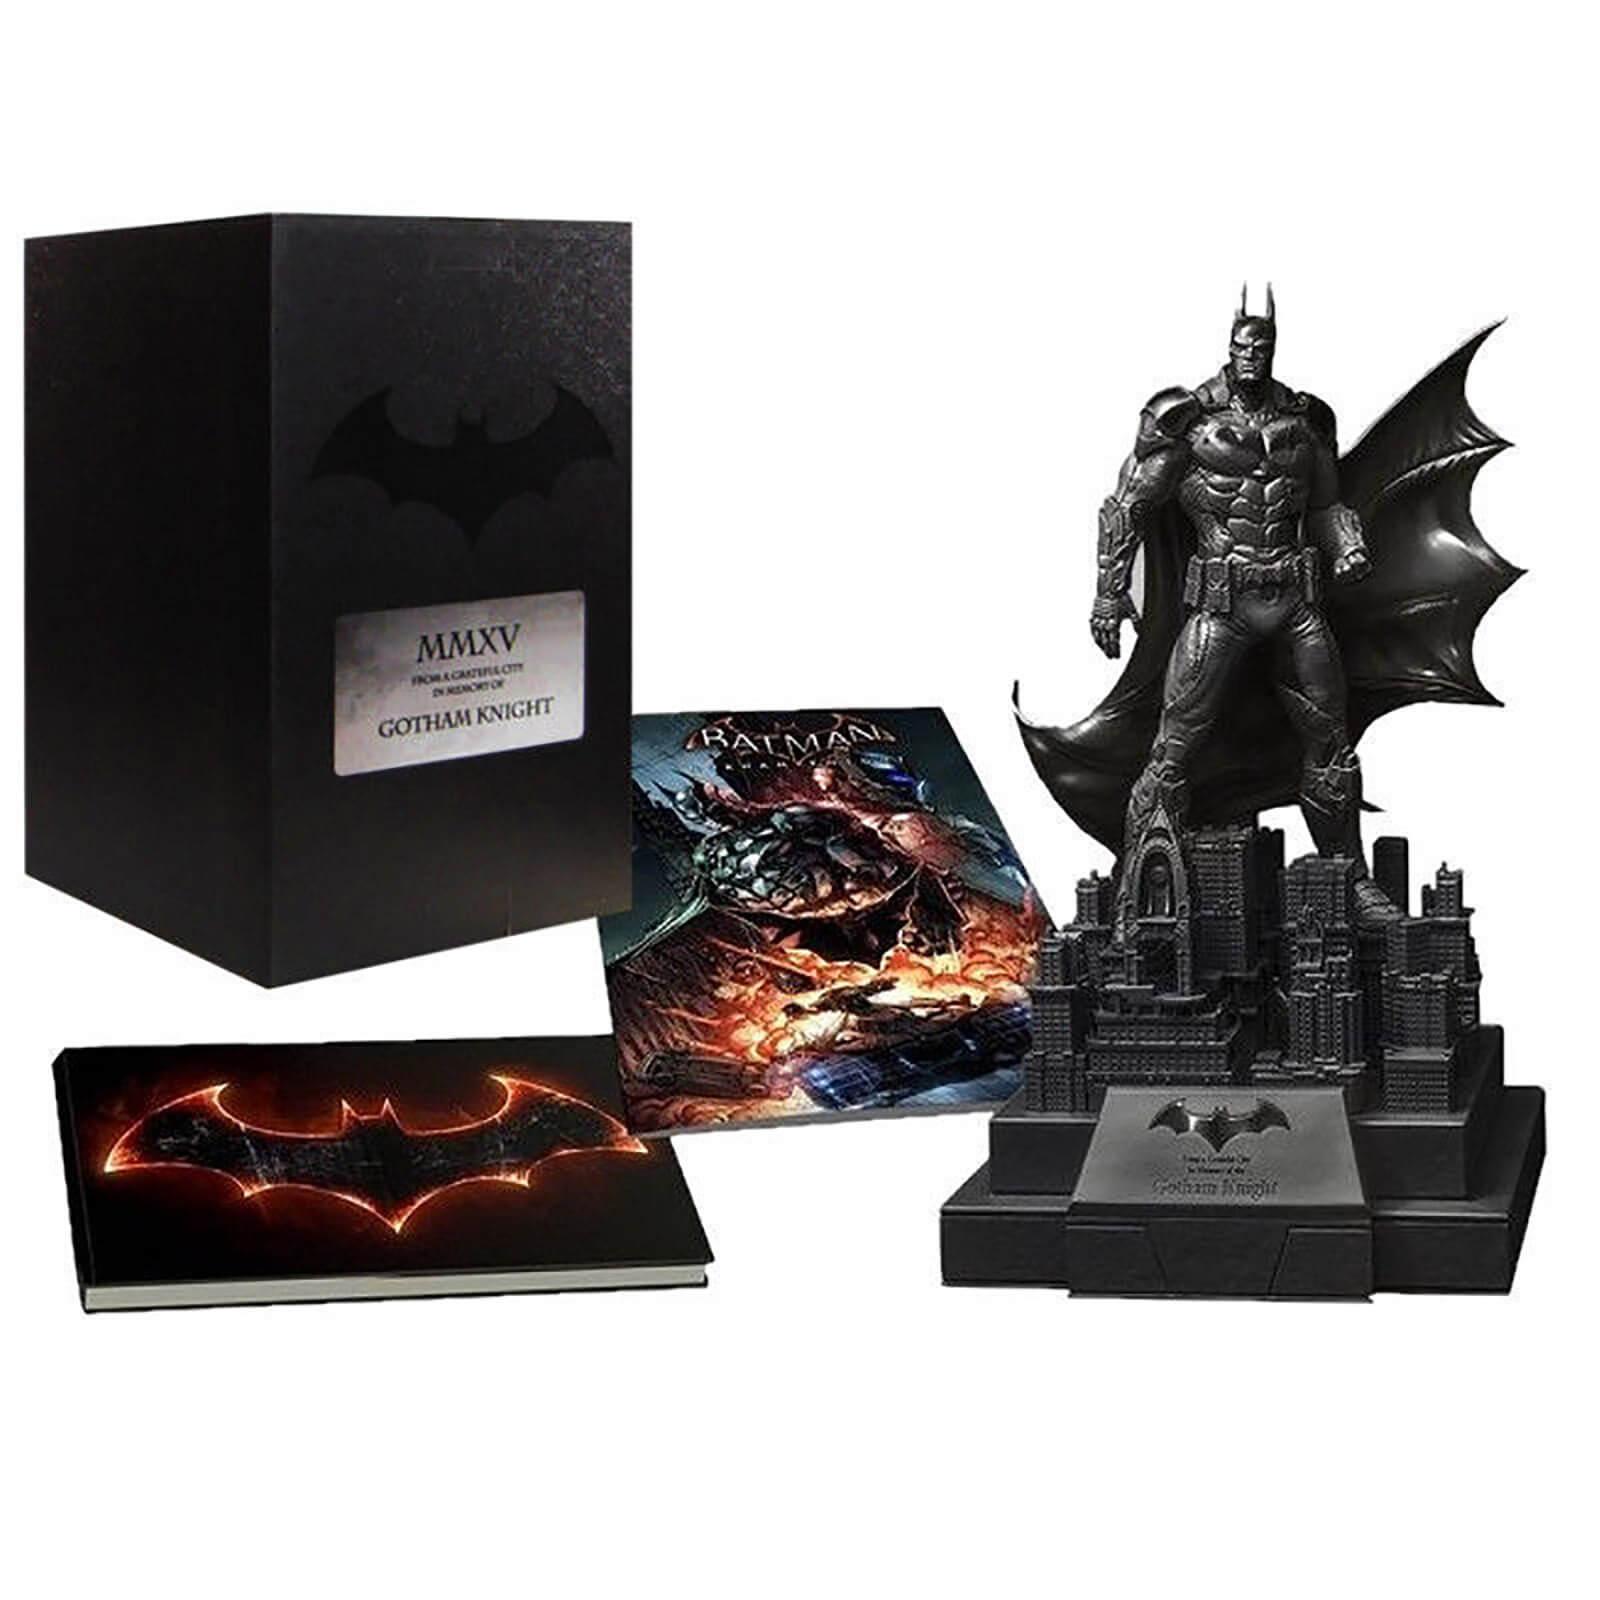 DC Comics Batman: Arkham Knight Limited Edition Collector's Set